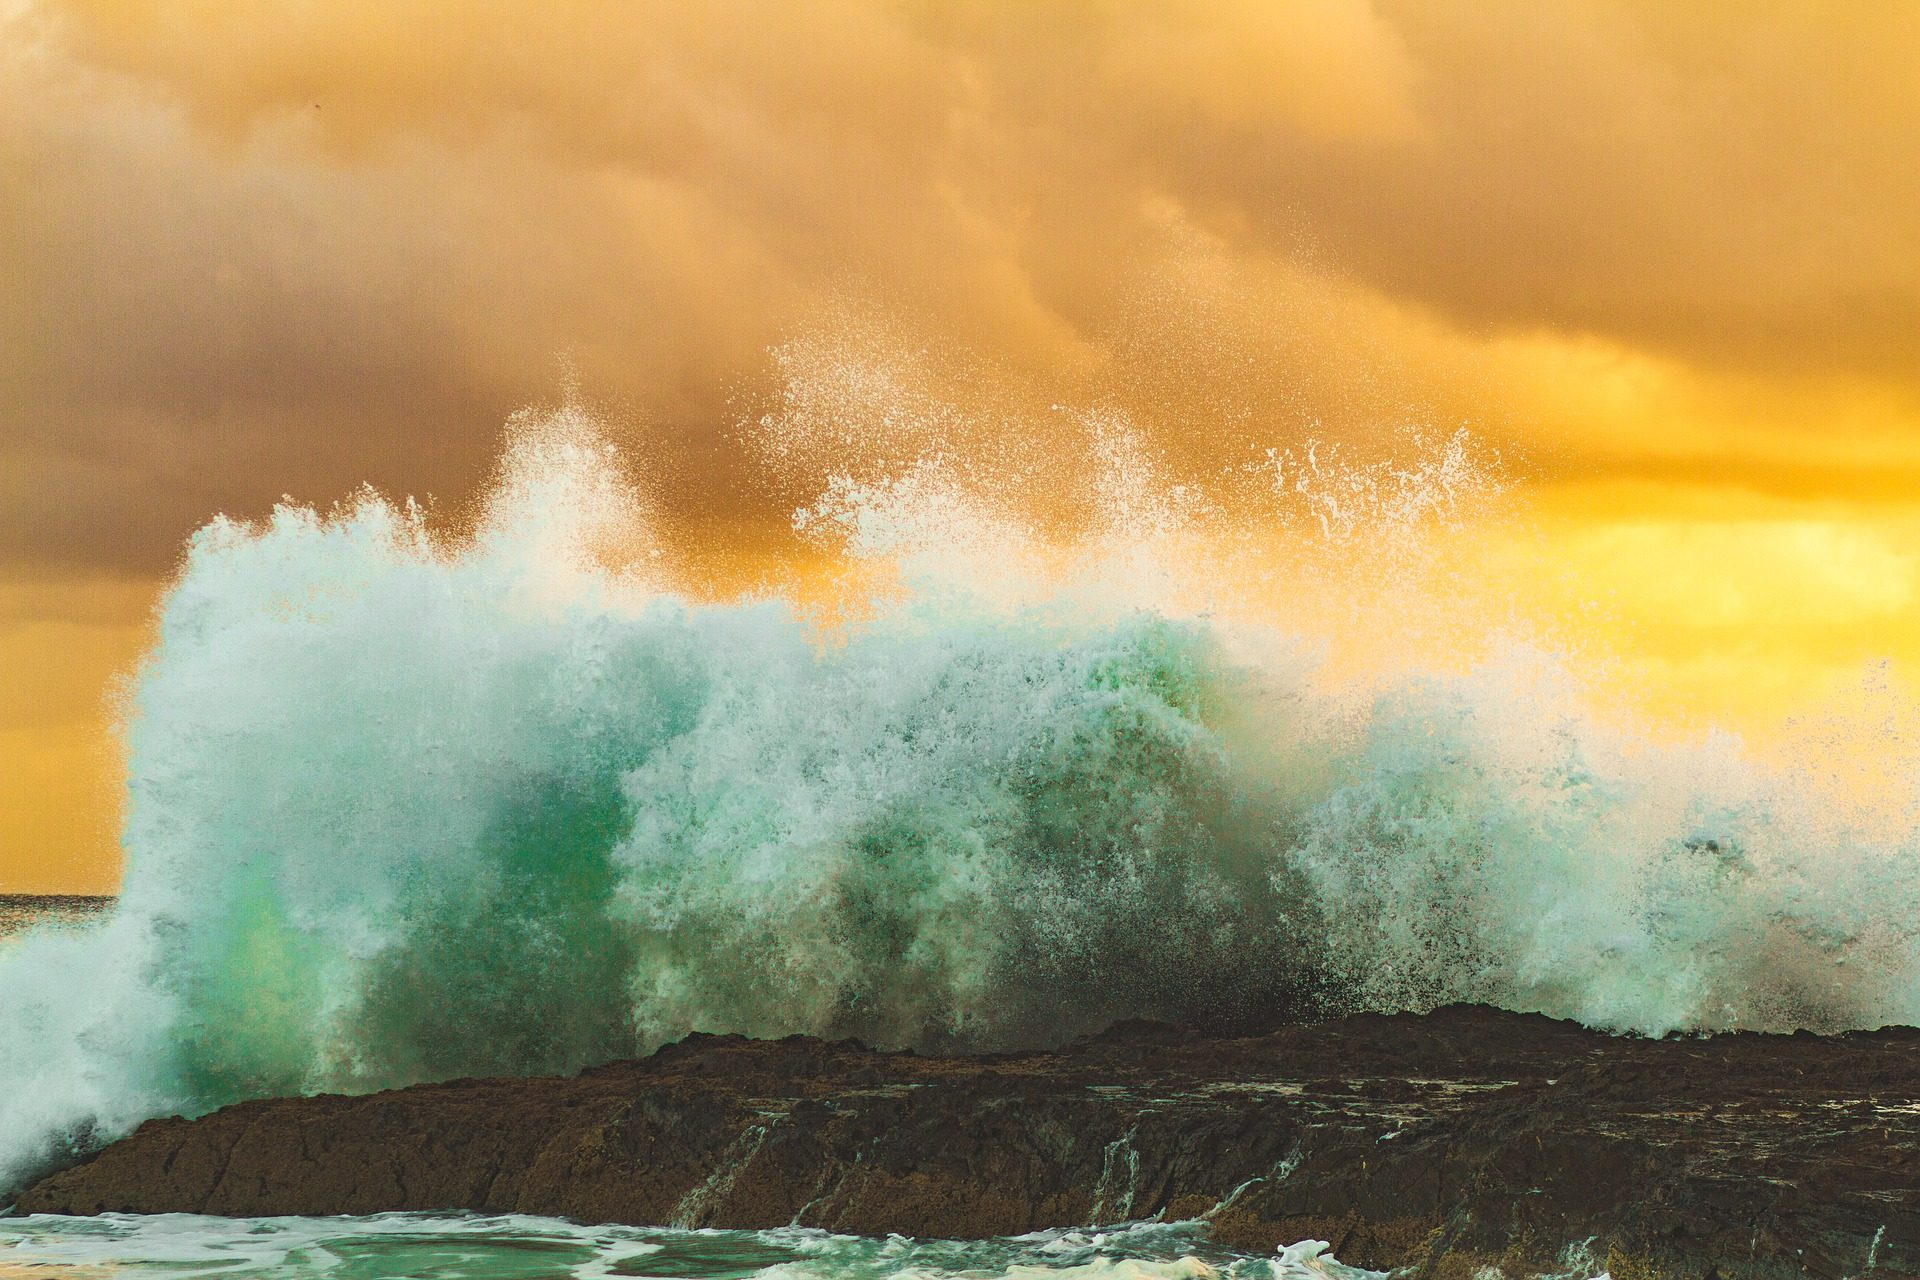 Ozean, Meer, Wellen, Kraft, Gefahr, Risiko - Wallpaper HD - Prof.-falken.com